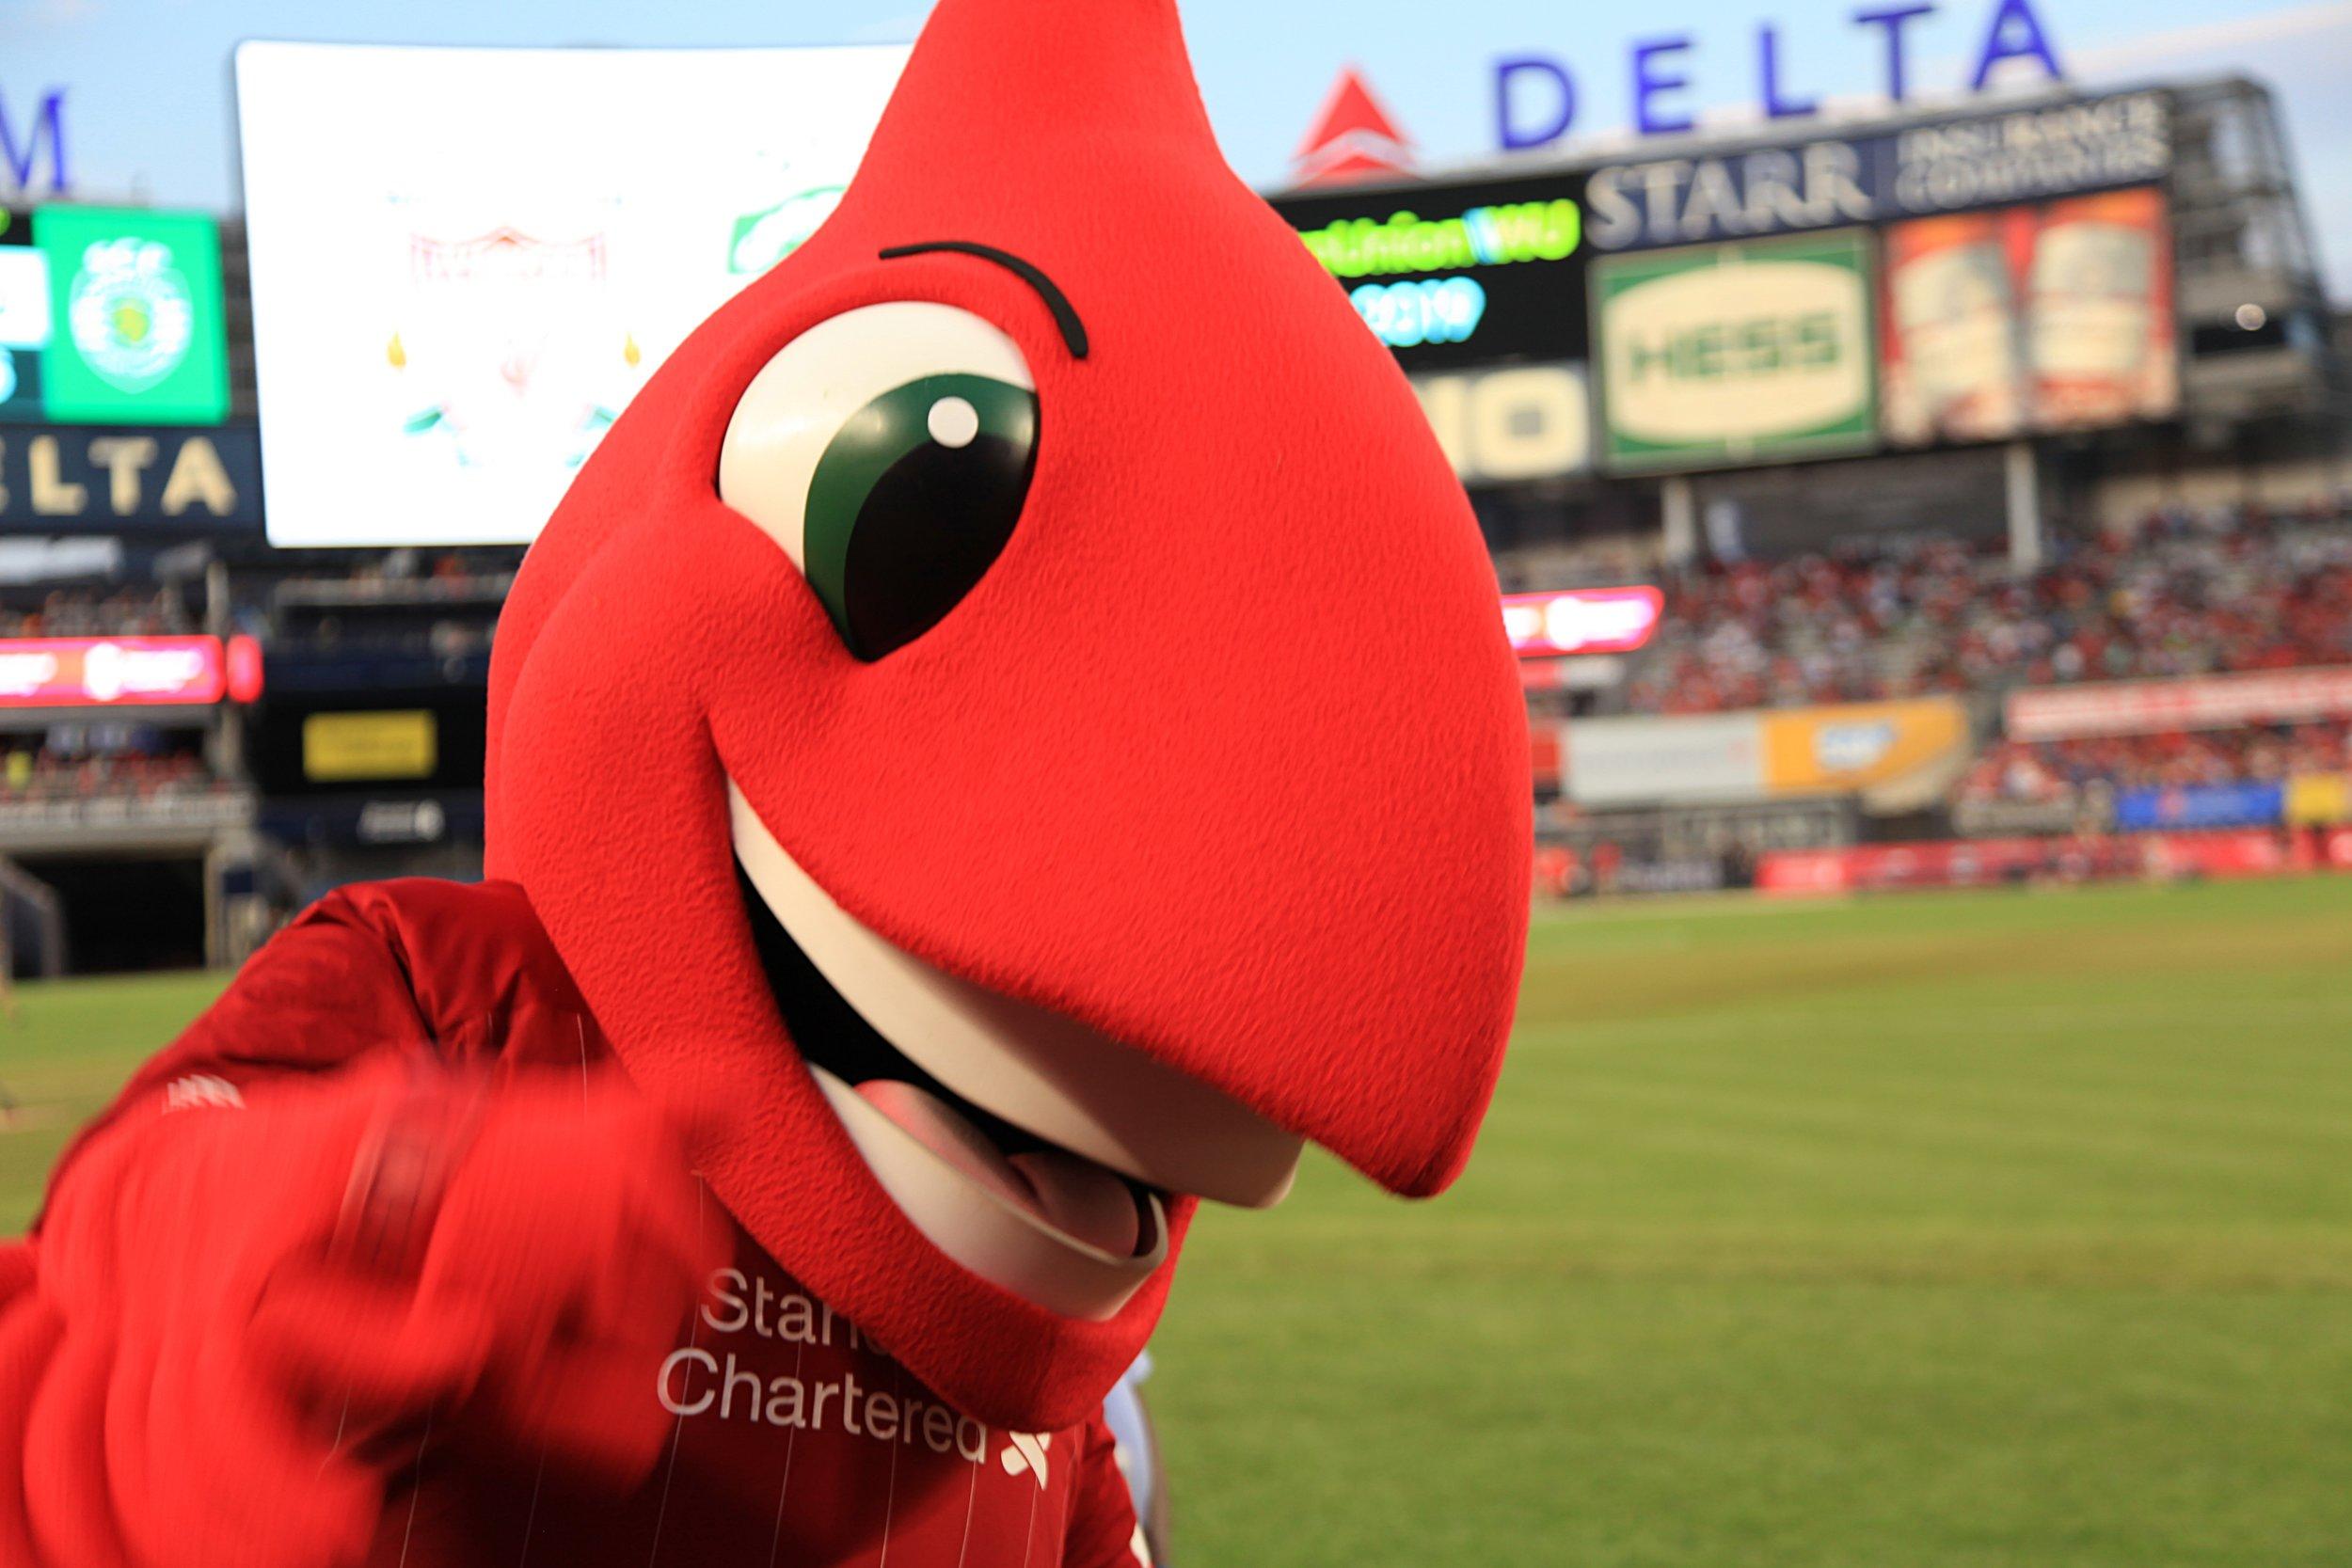 Big Red saying hello.